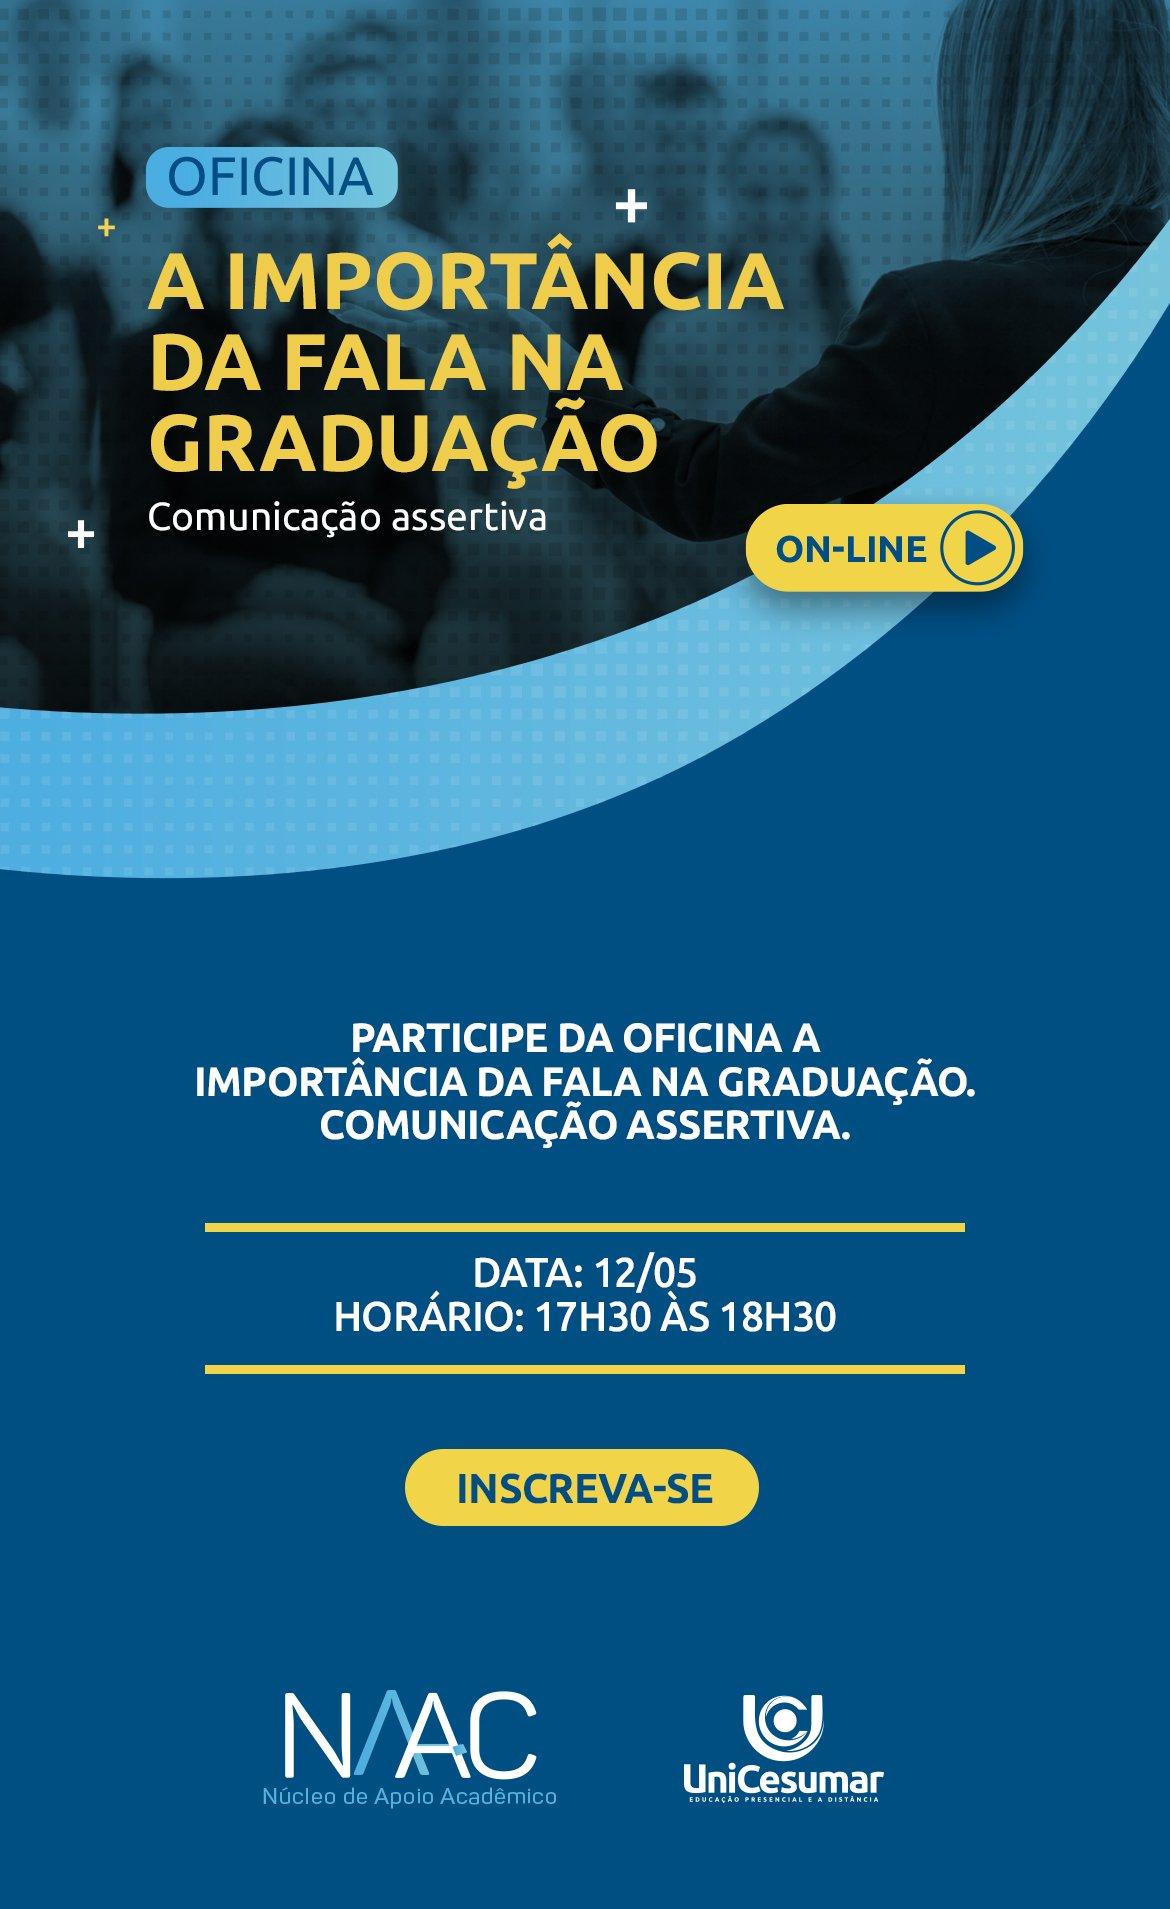 4564_hotsite_importancia_da_fala_graduacao_oficinas_naac_2021